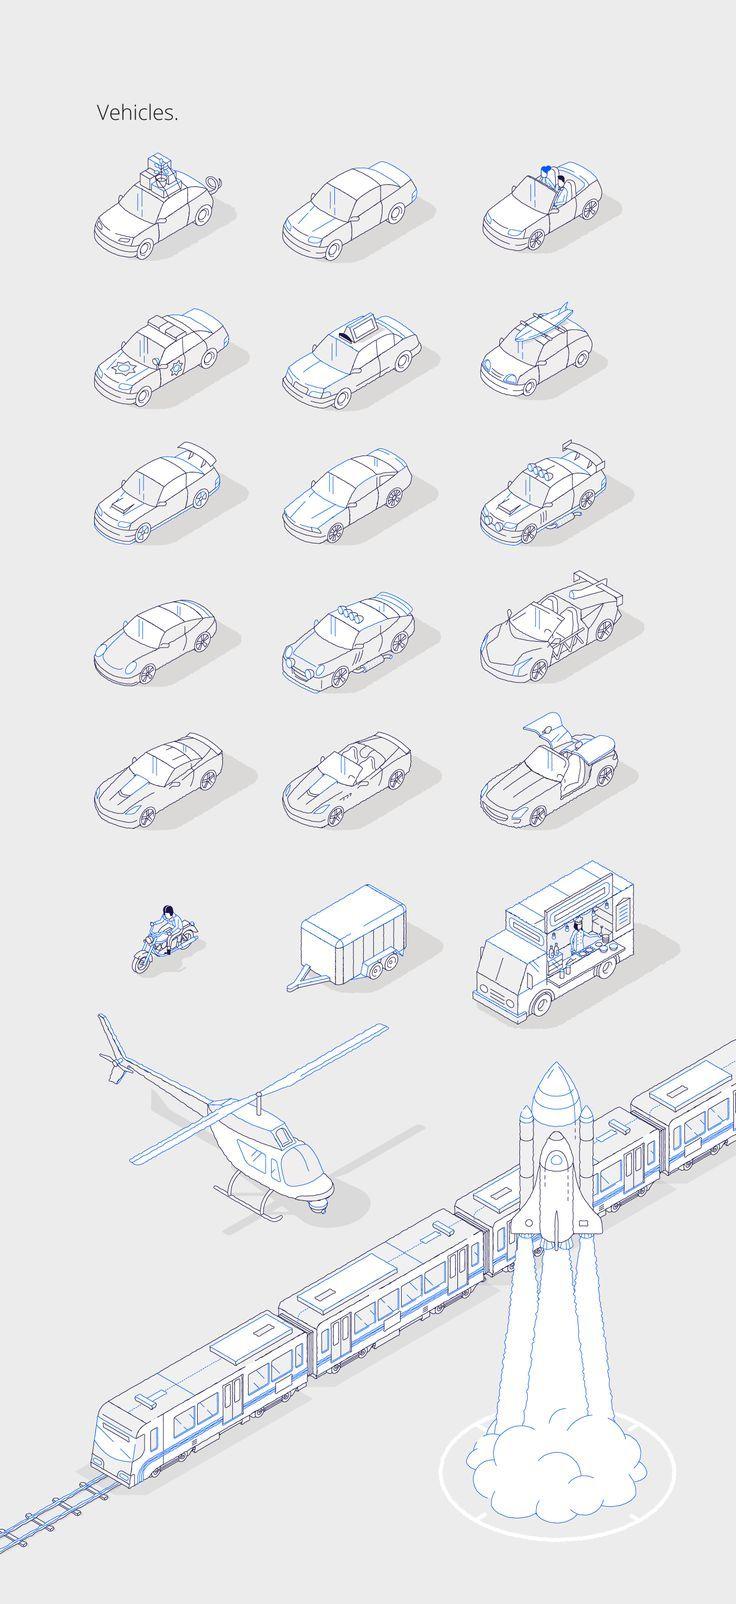 CHASE Illustrations on Behance | Illustrations | Axonometric